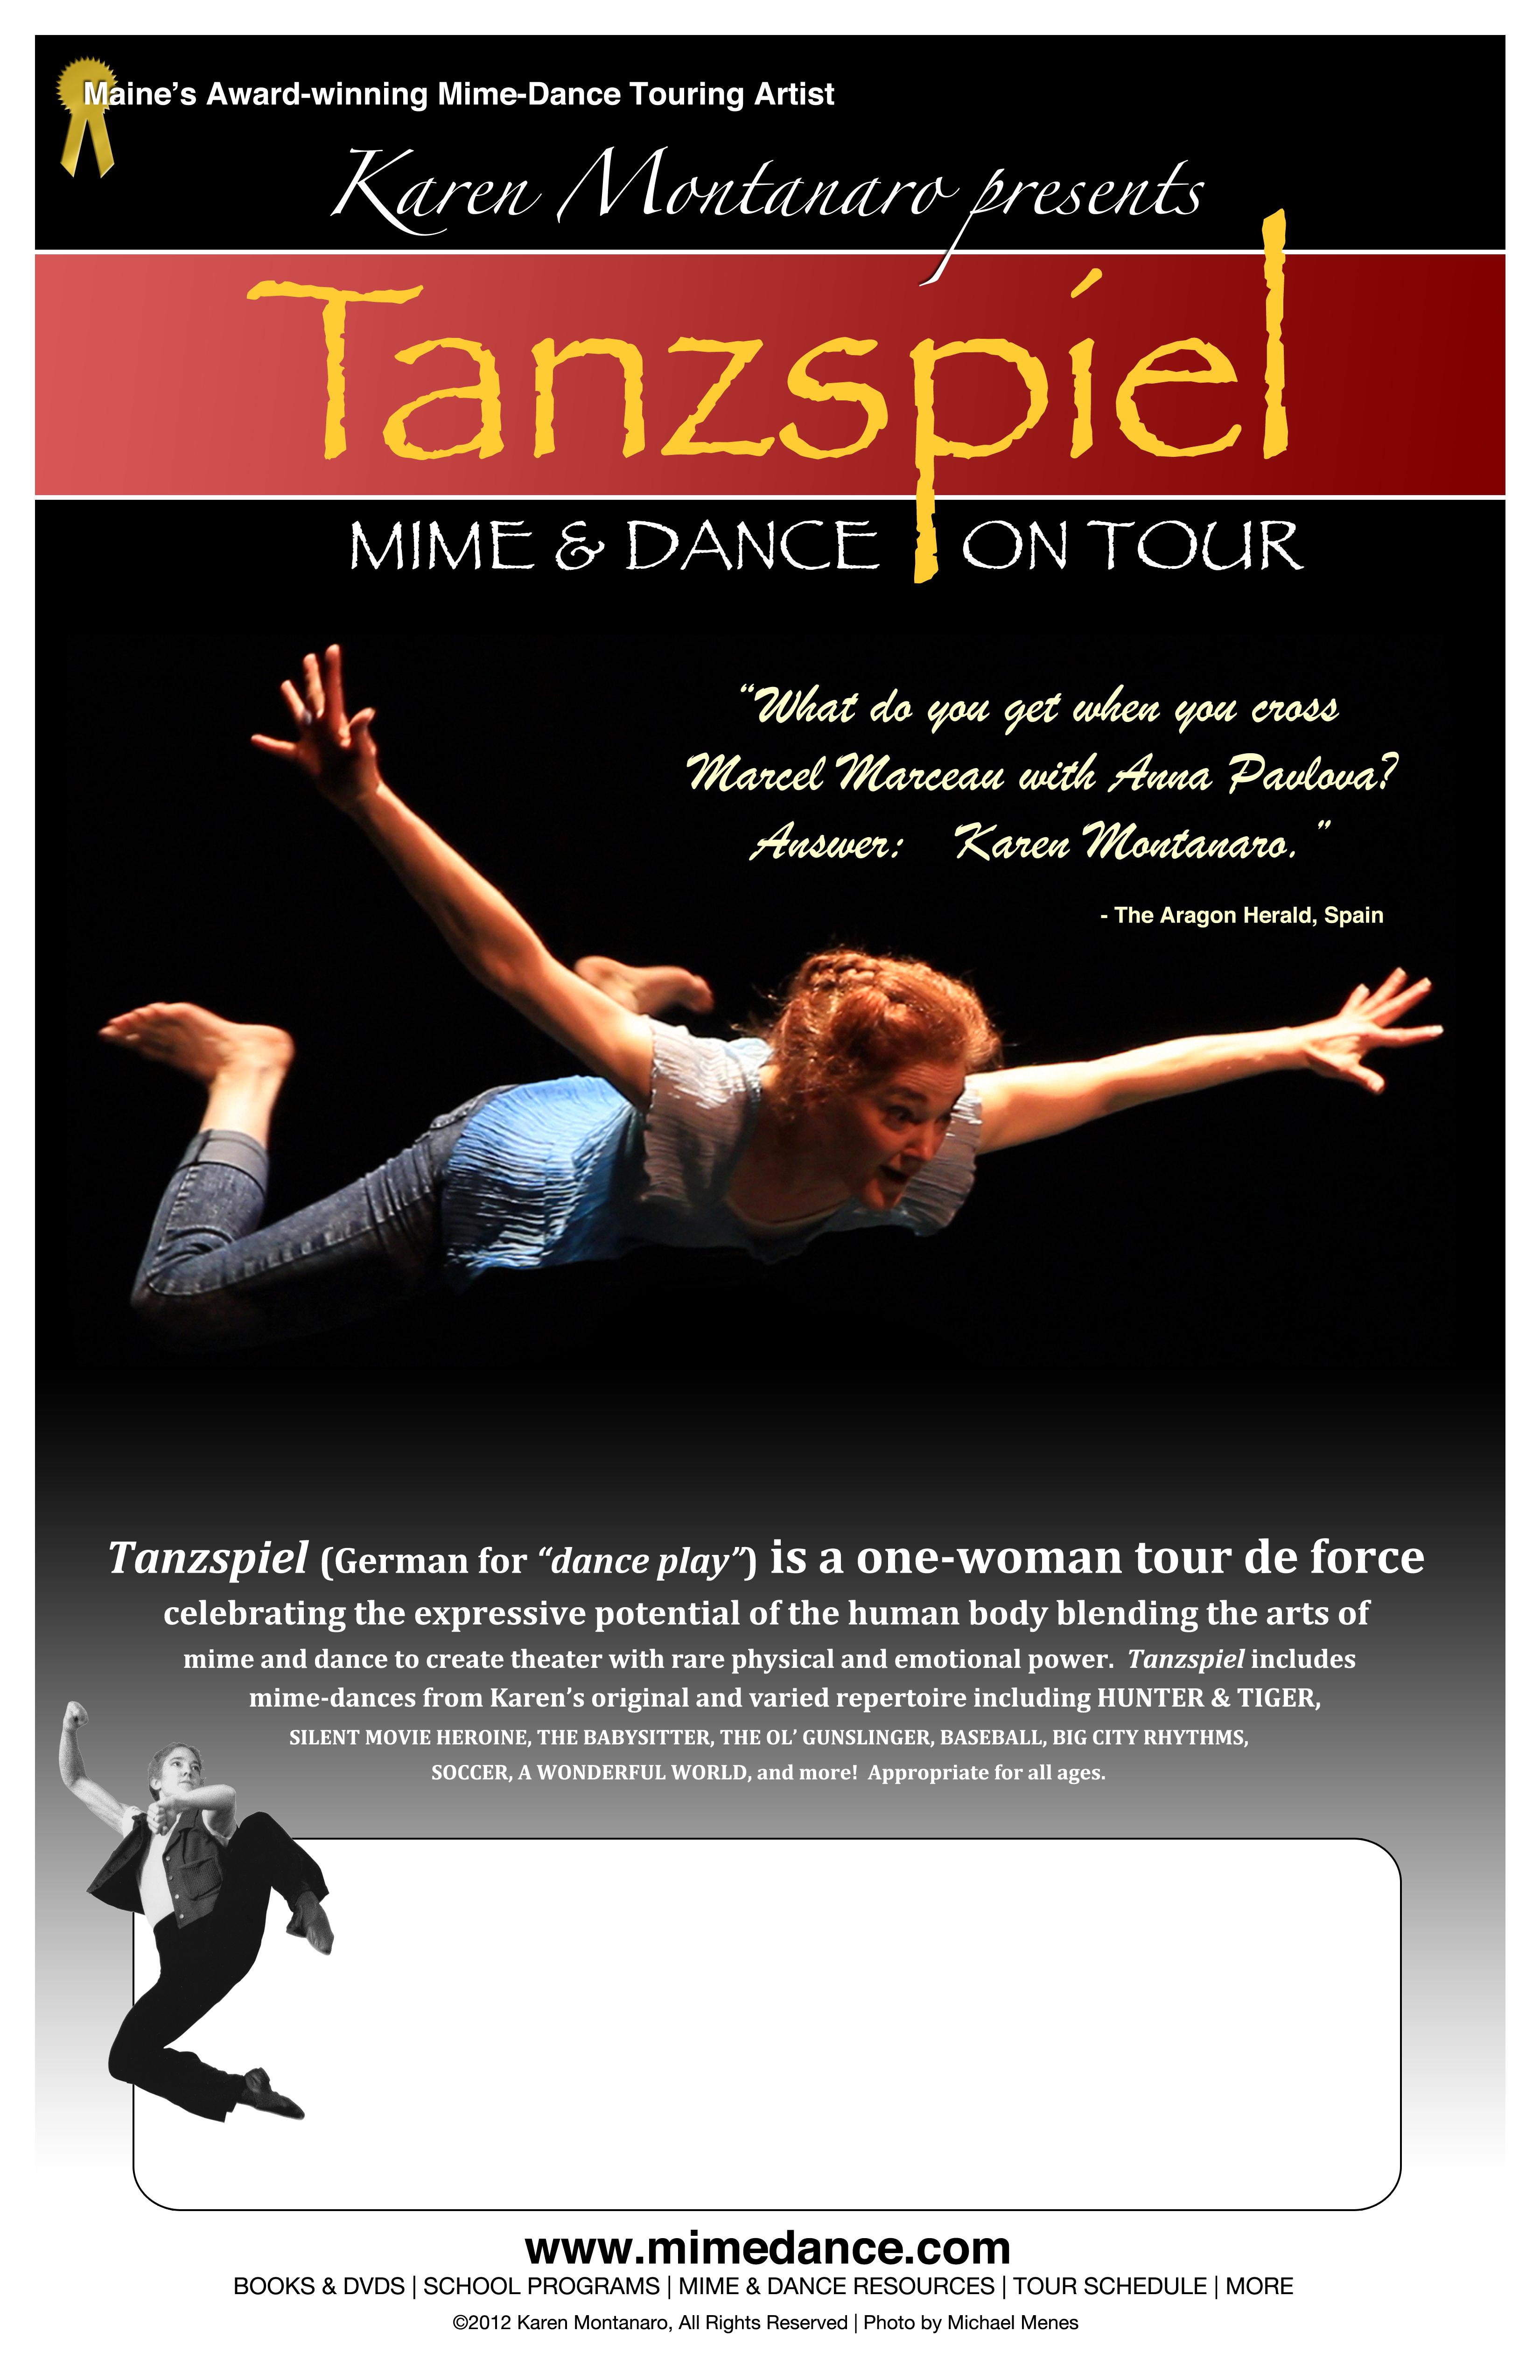 tanzspiel karen montanaro mime and dance on tour